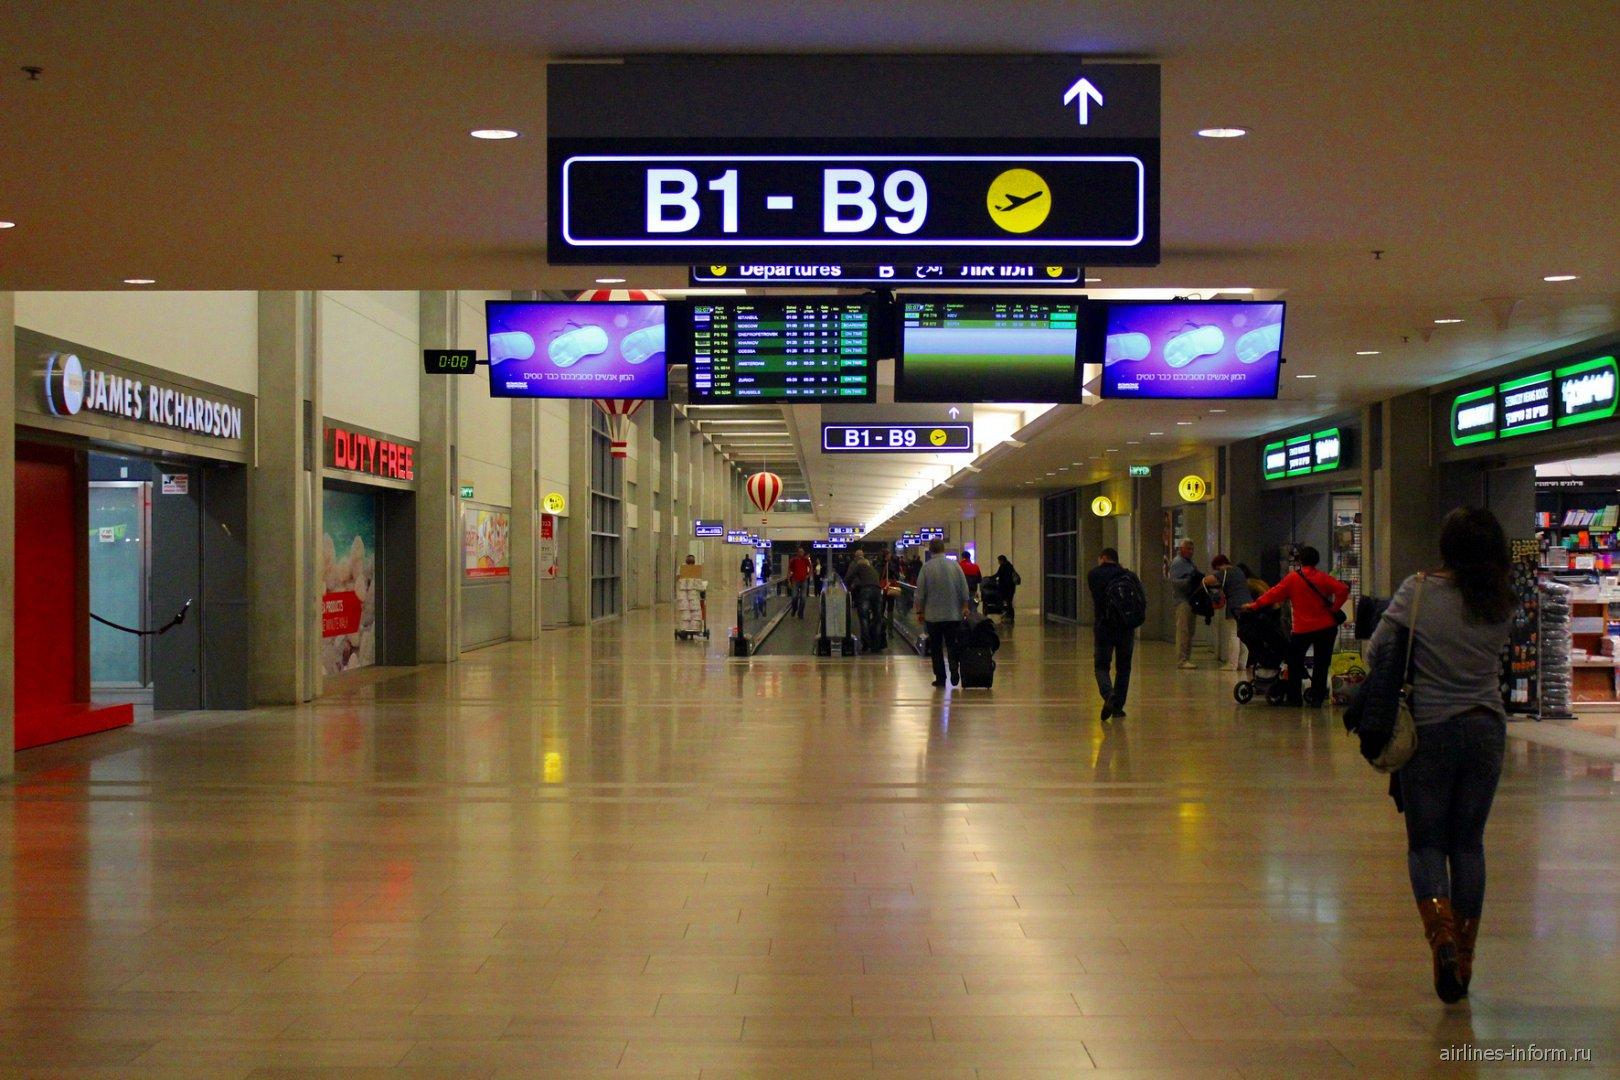 Галерея выходов на посадку в аэропорту Тель-Авив Бен Гурион